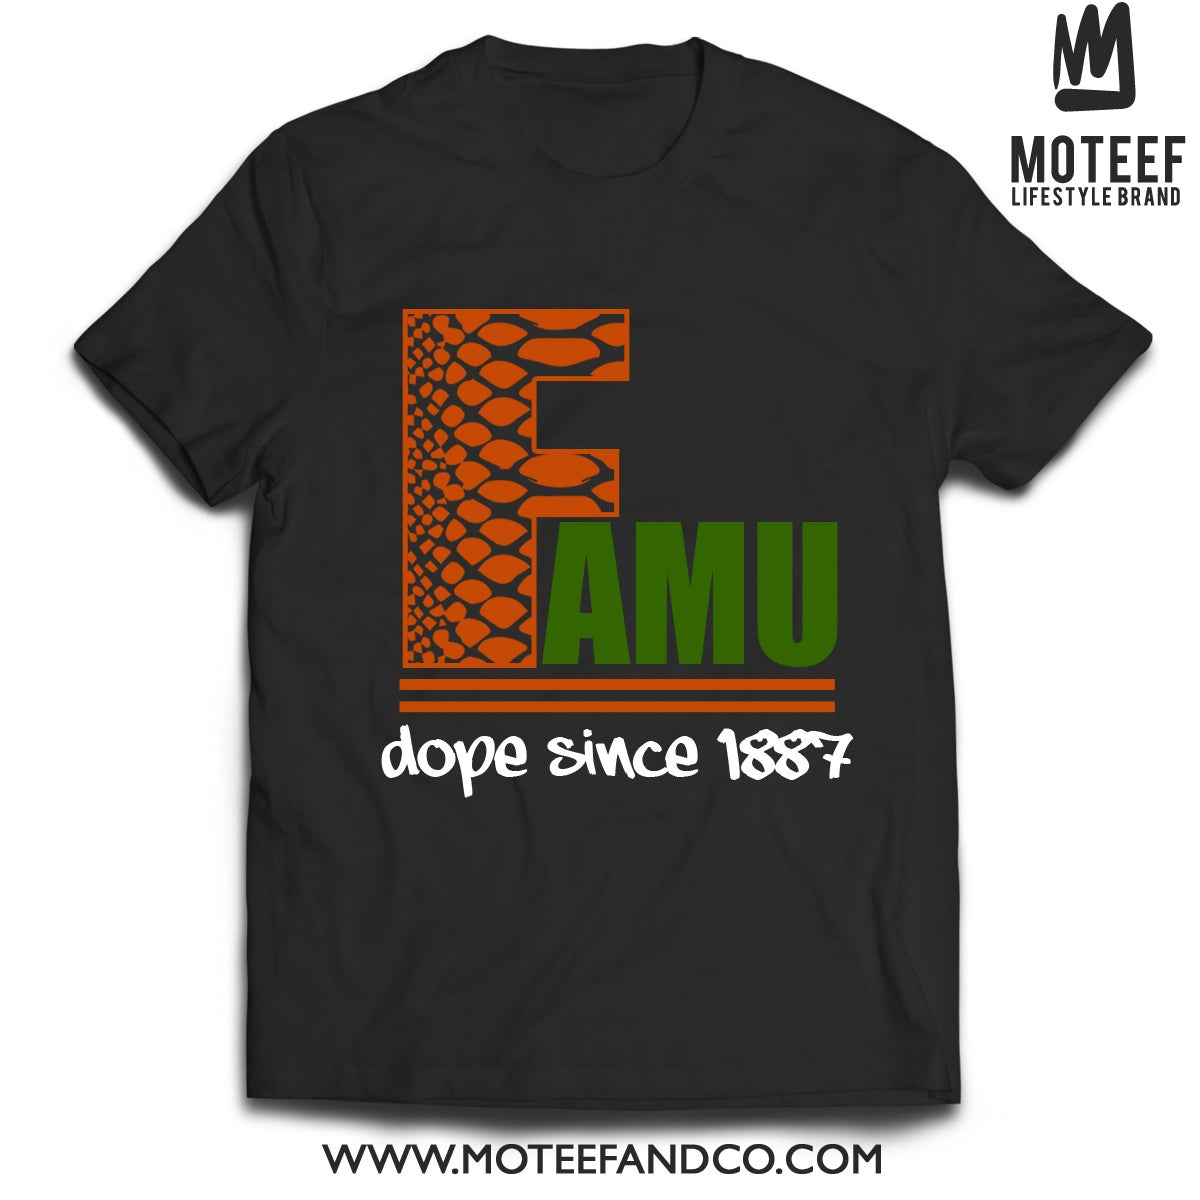 Image of FAMU Dope Since '87